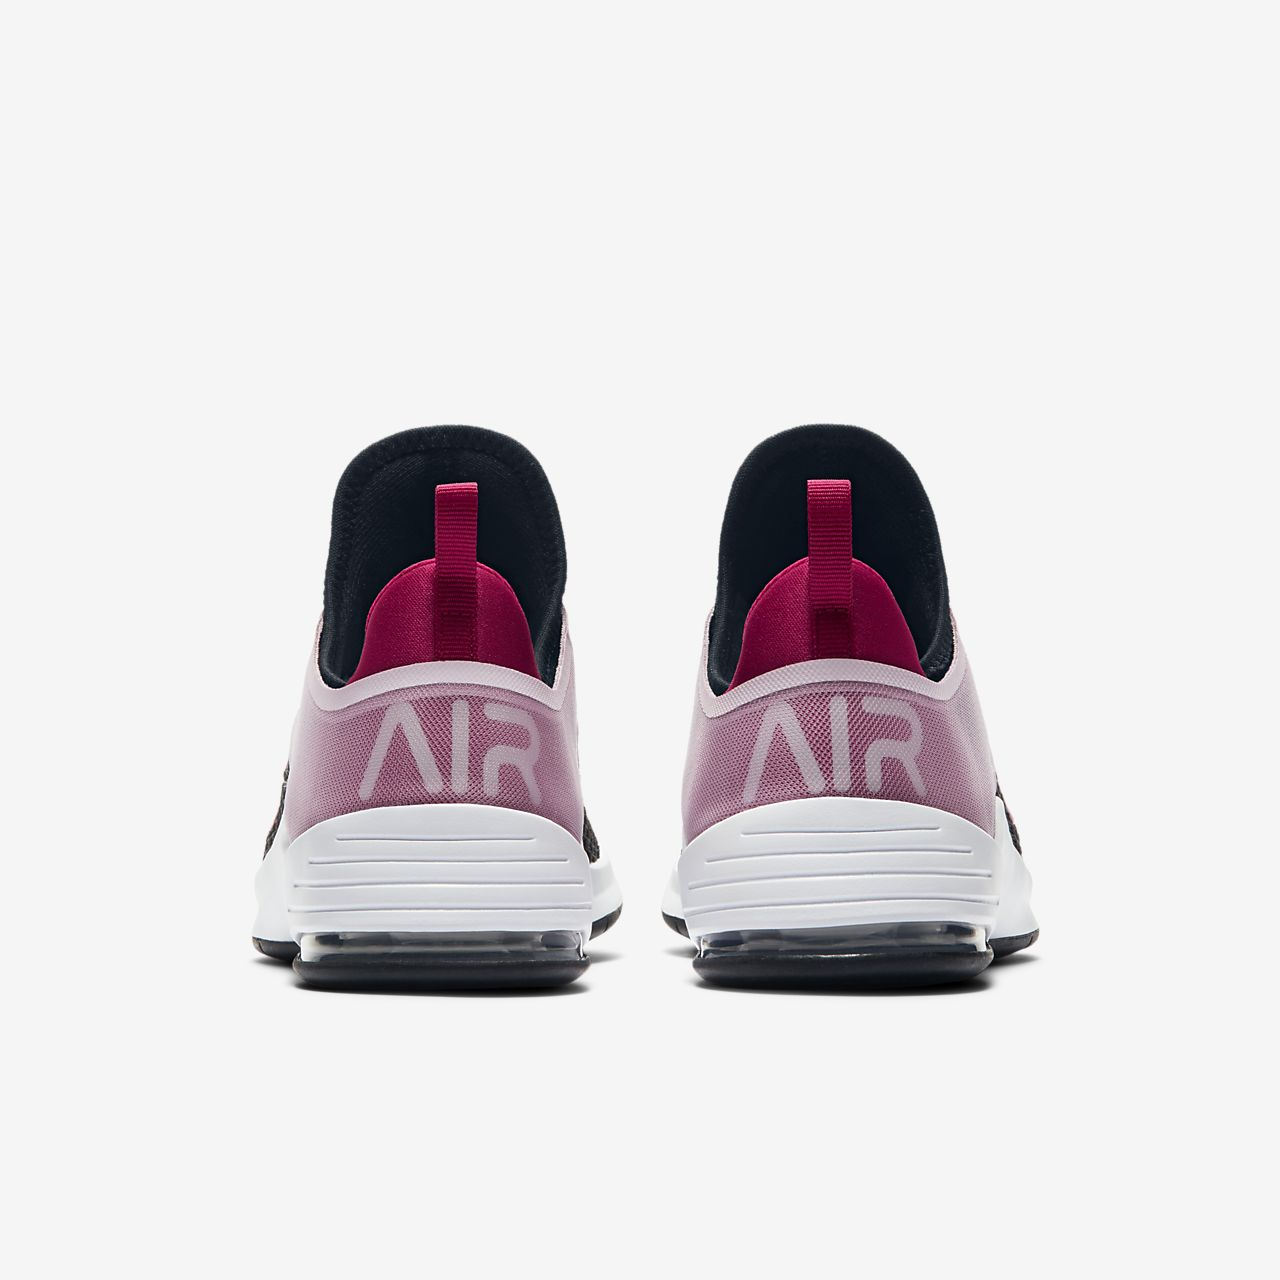 Nike Air Max Box Pistachio Frost (W)